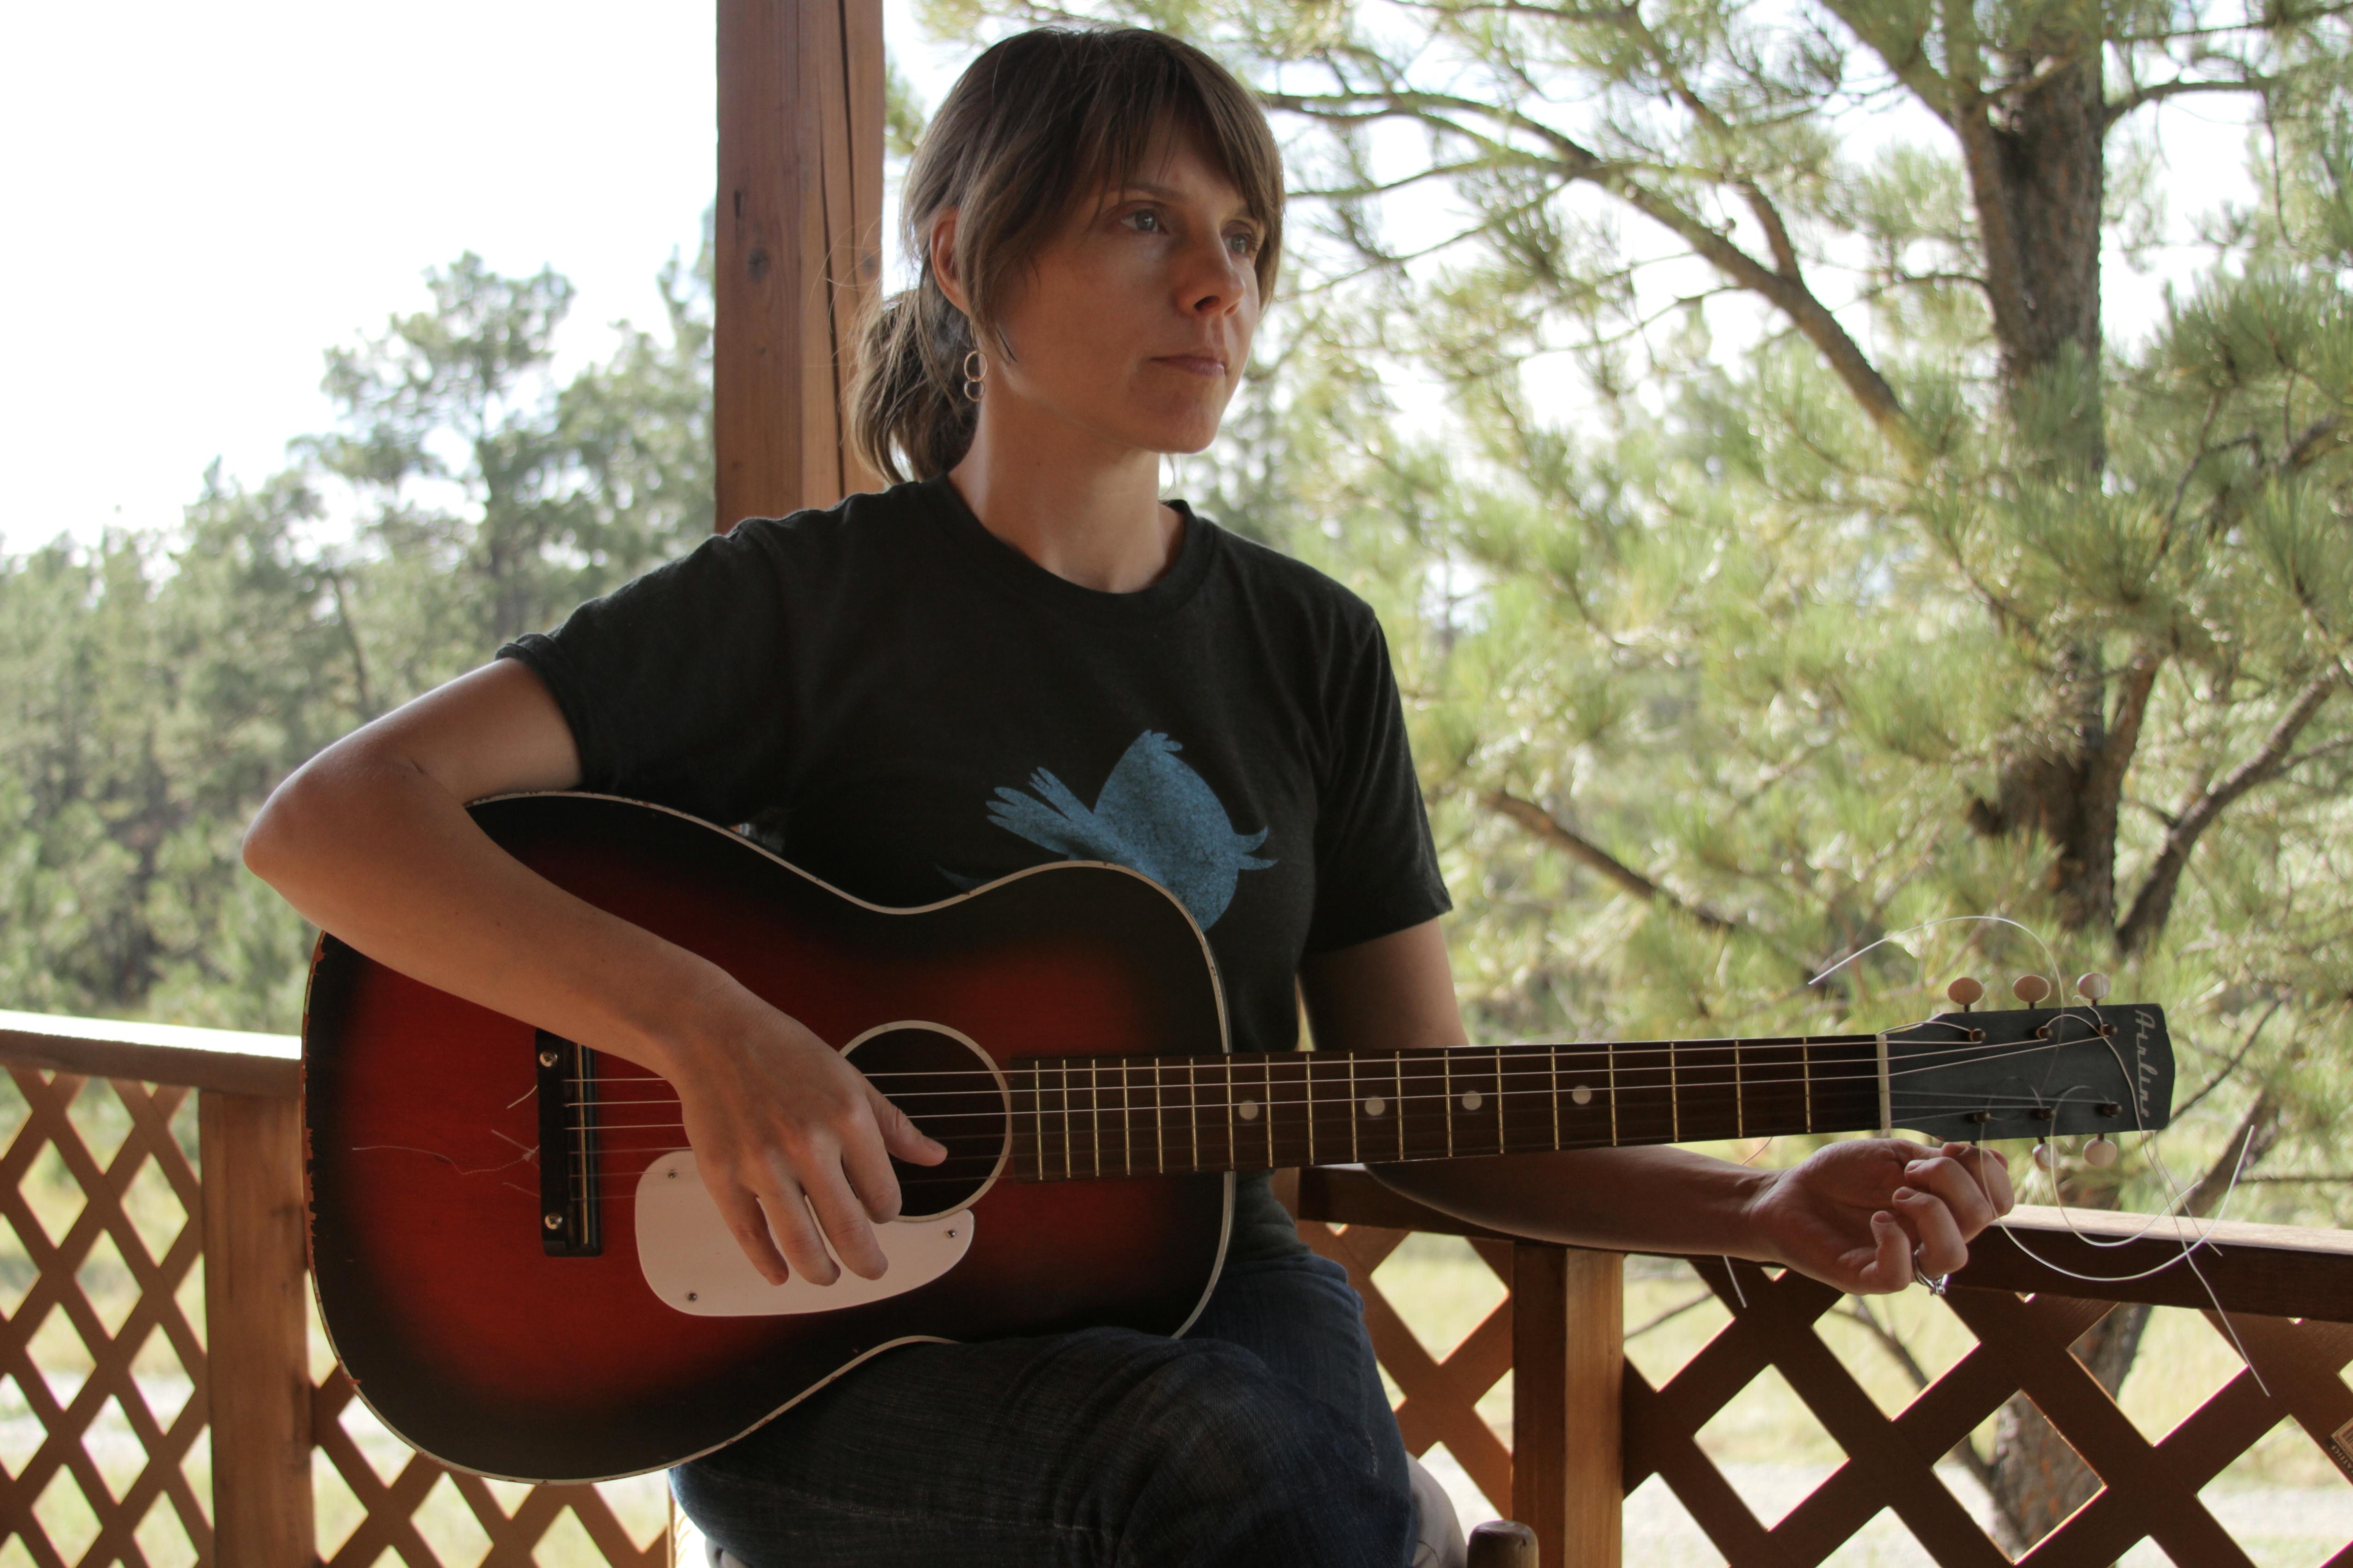 chitarra acustica folk parlor